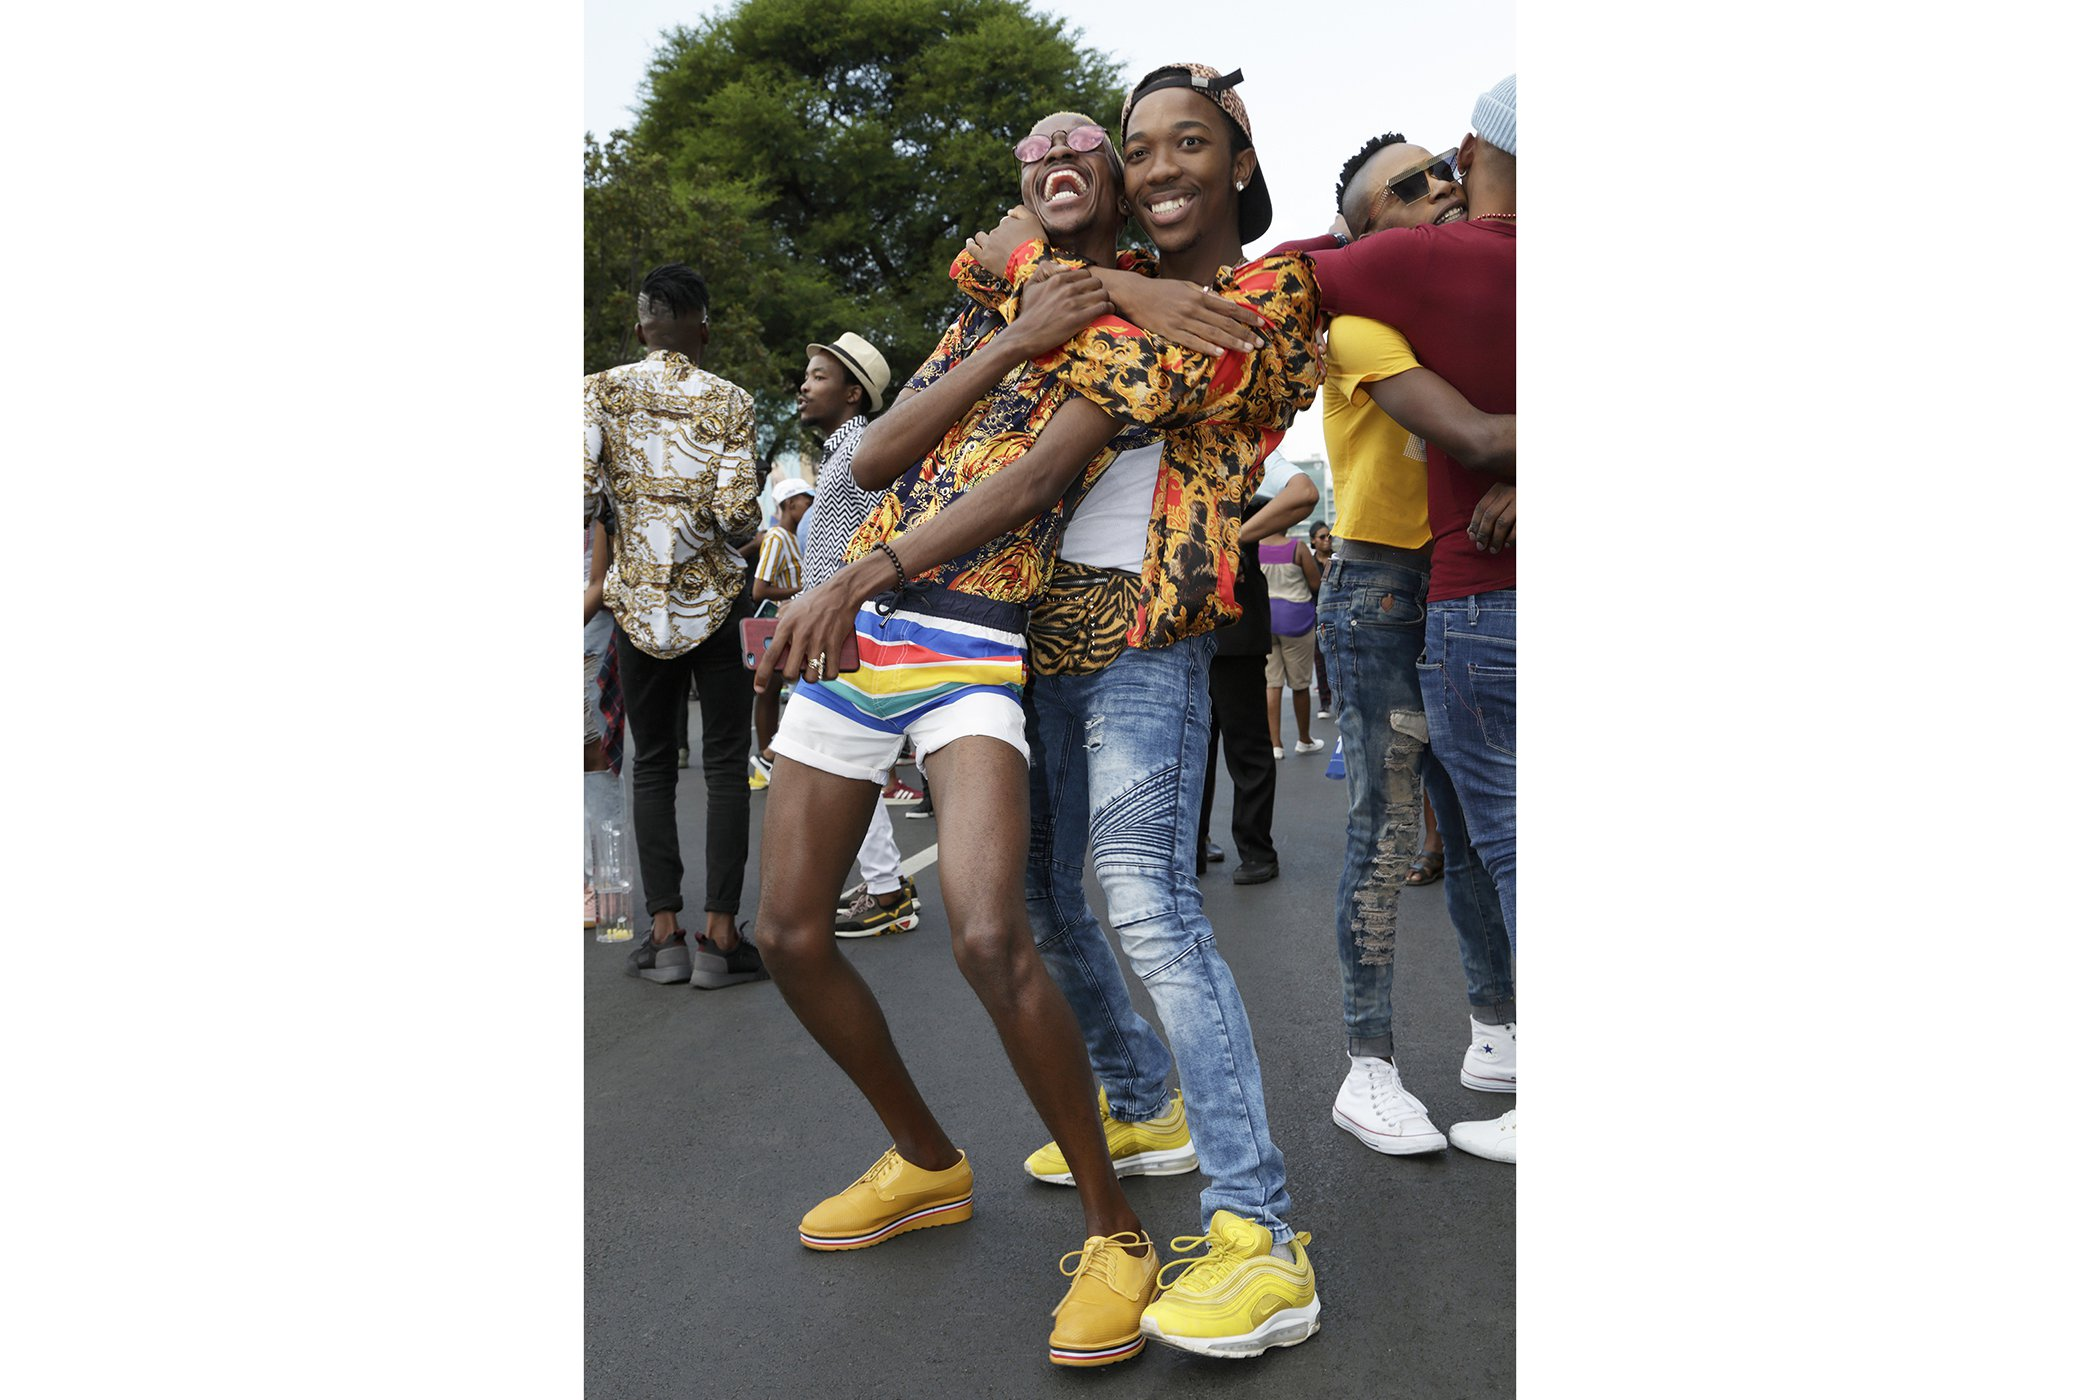 Johannesburg_Pride_LGBTQ_Noncedo Gxekwa_022-FULL.jpg